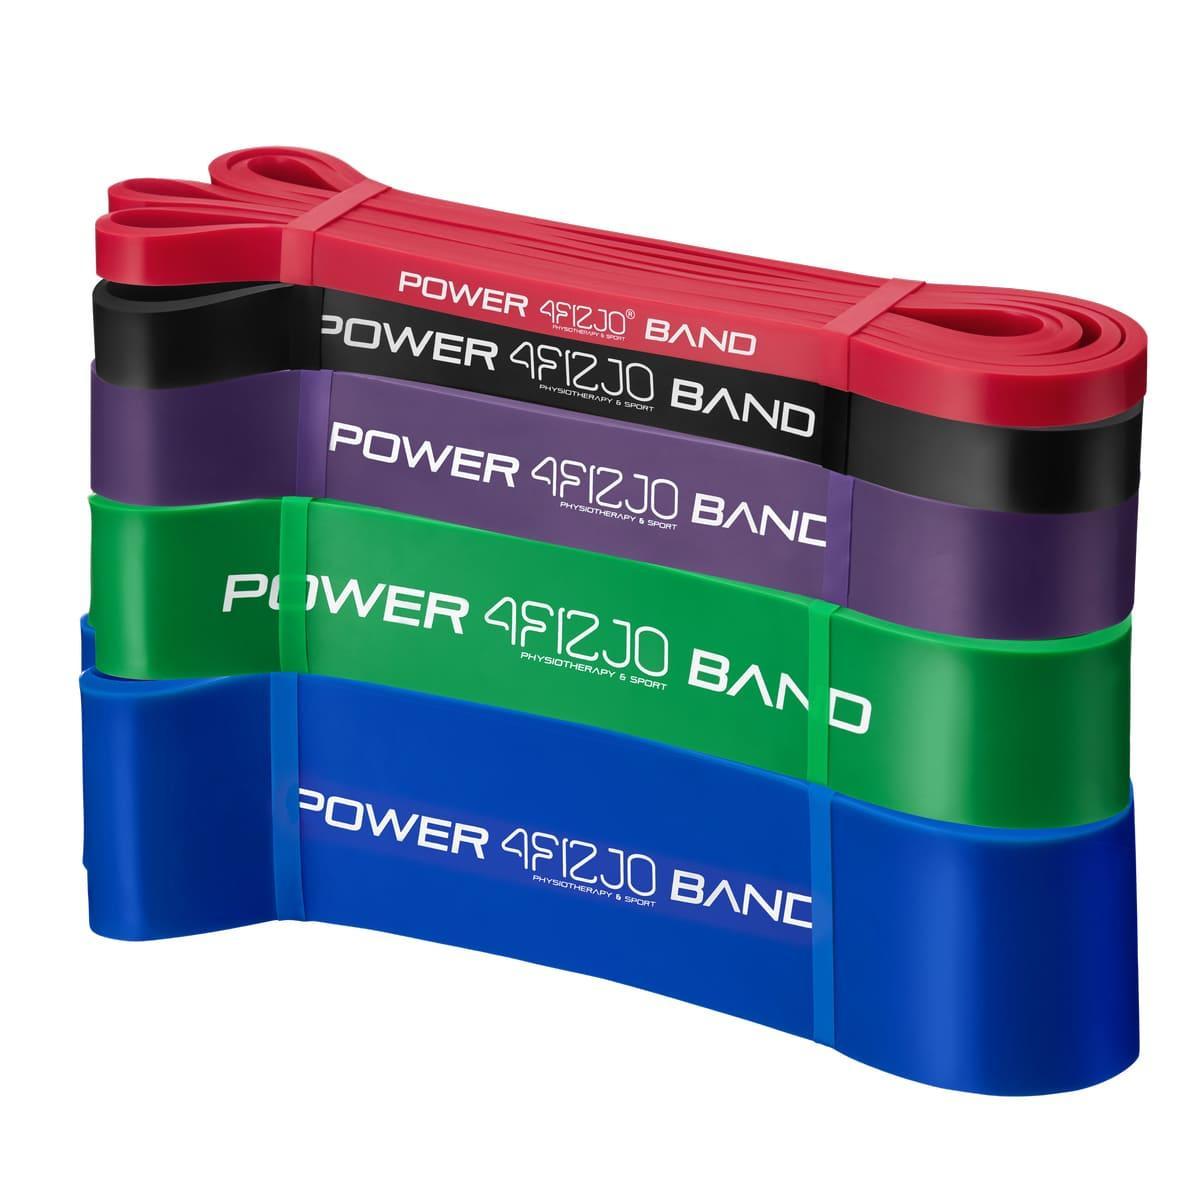 Еспандер-петля (гумка для фітнесу і спорту) 4FIZJO Power Band 5 шт 6-46 кг 4FJ0001